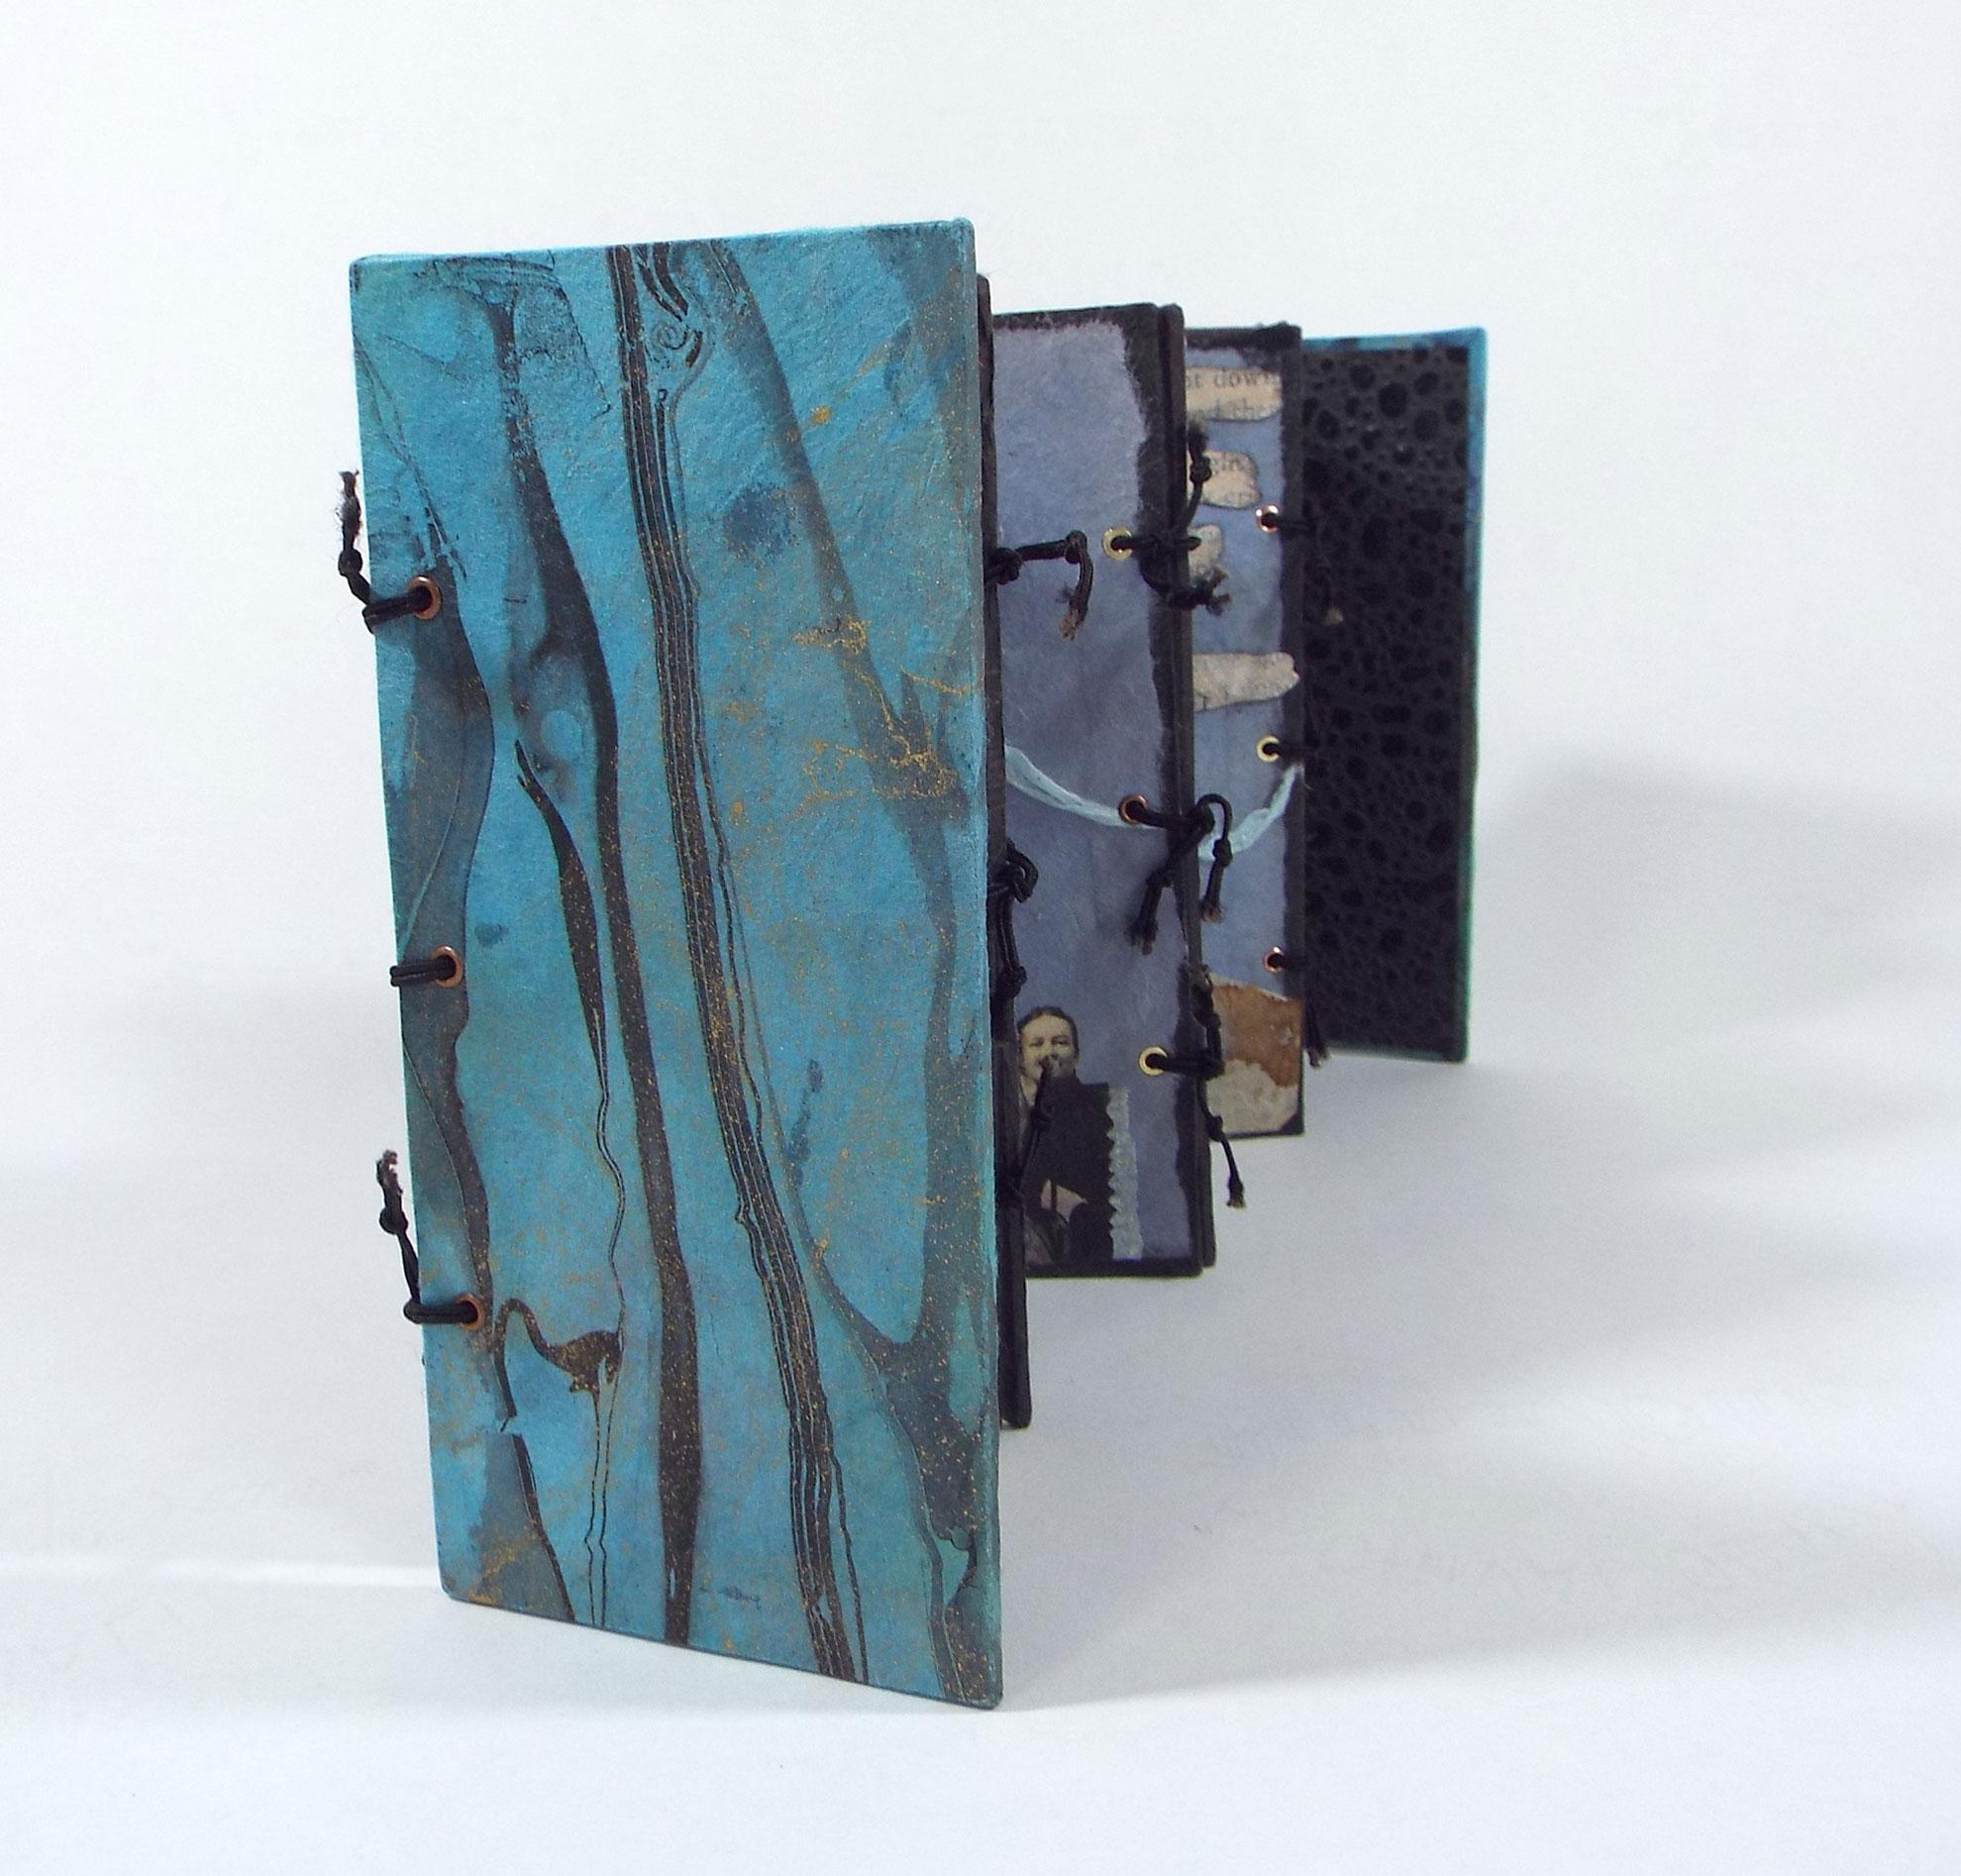 DJ Gaskin, Blue Days, Blue Nights, Mixed media artist's book, 2015, $300, Saluda, NC